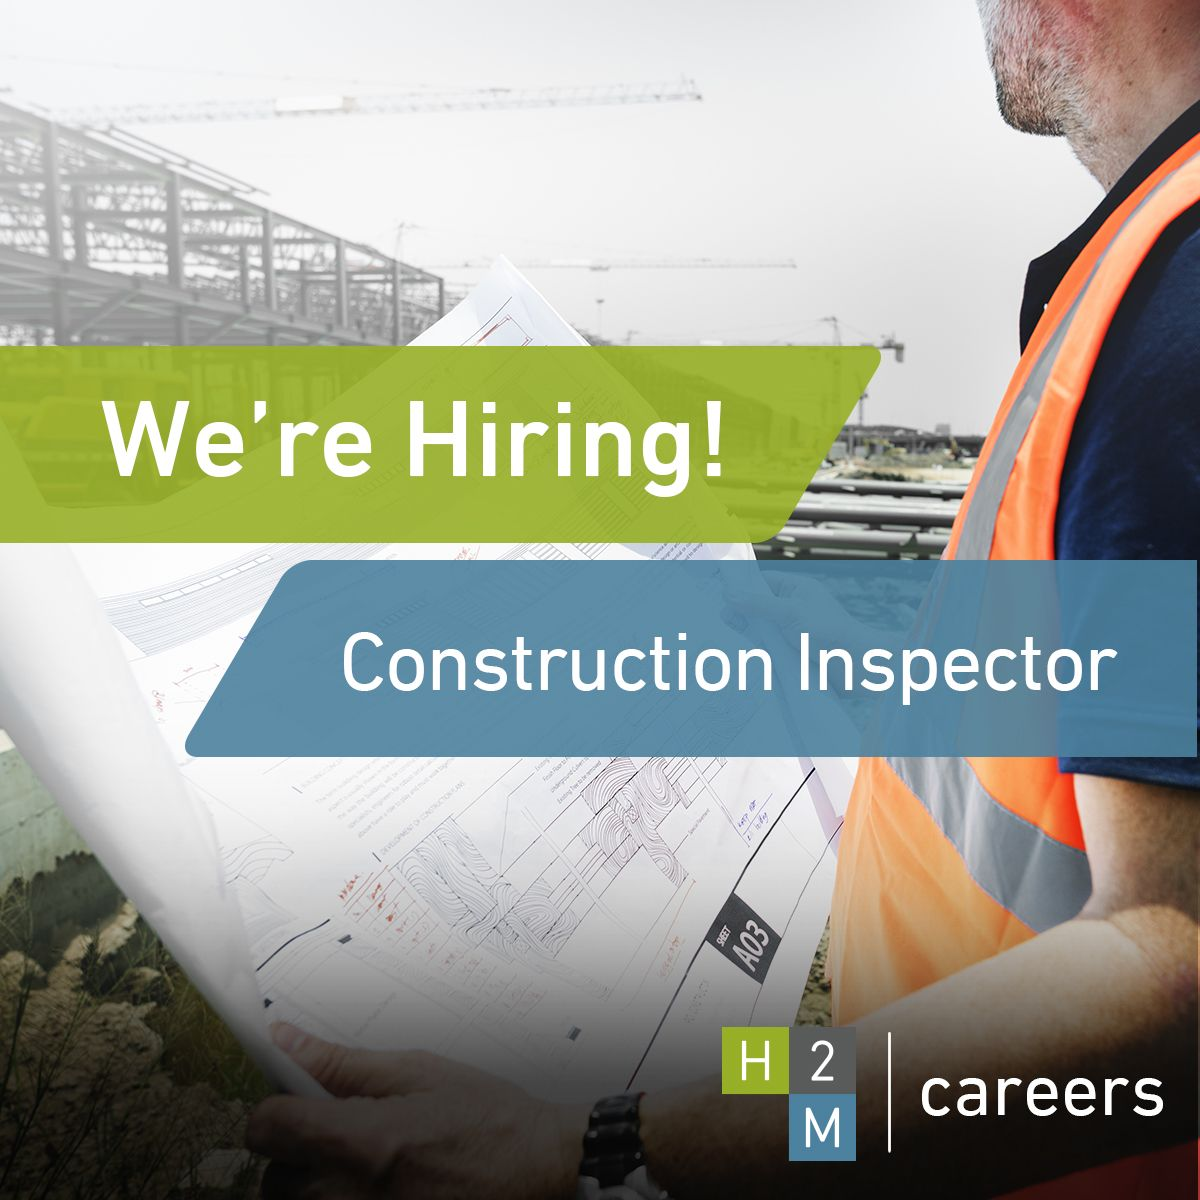 We Re Seeking A Construction Inspector Pseg Li In Melville With 5 Years Of Experience Job Description The Idea Electrical Inspector Job Description Career